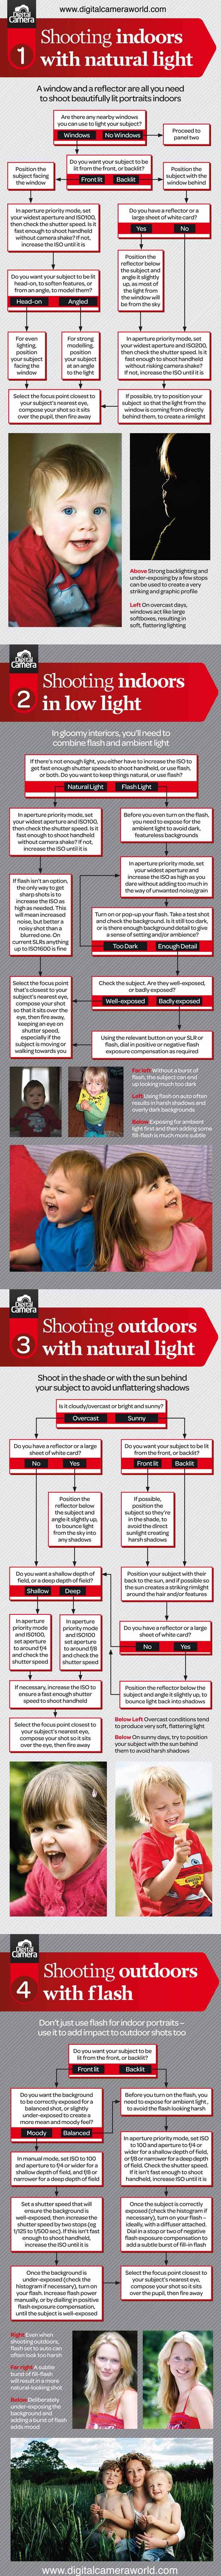 Free Family Portrait Photography Cheat Sheet Techradar